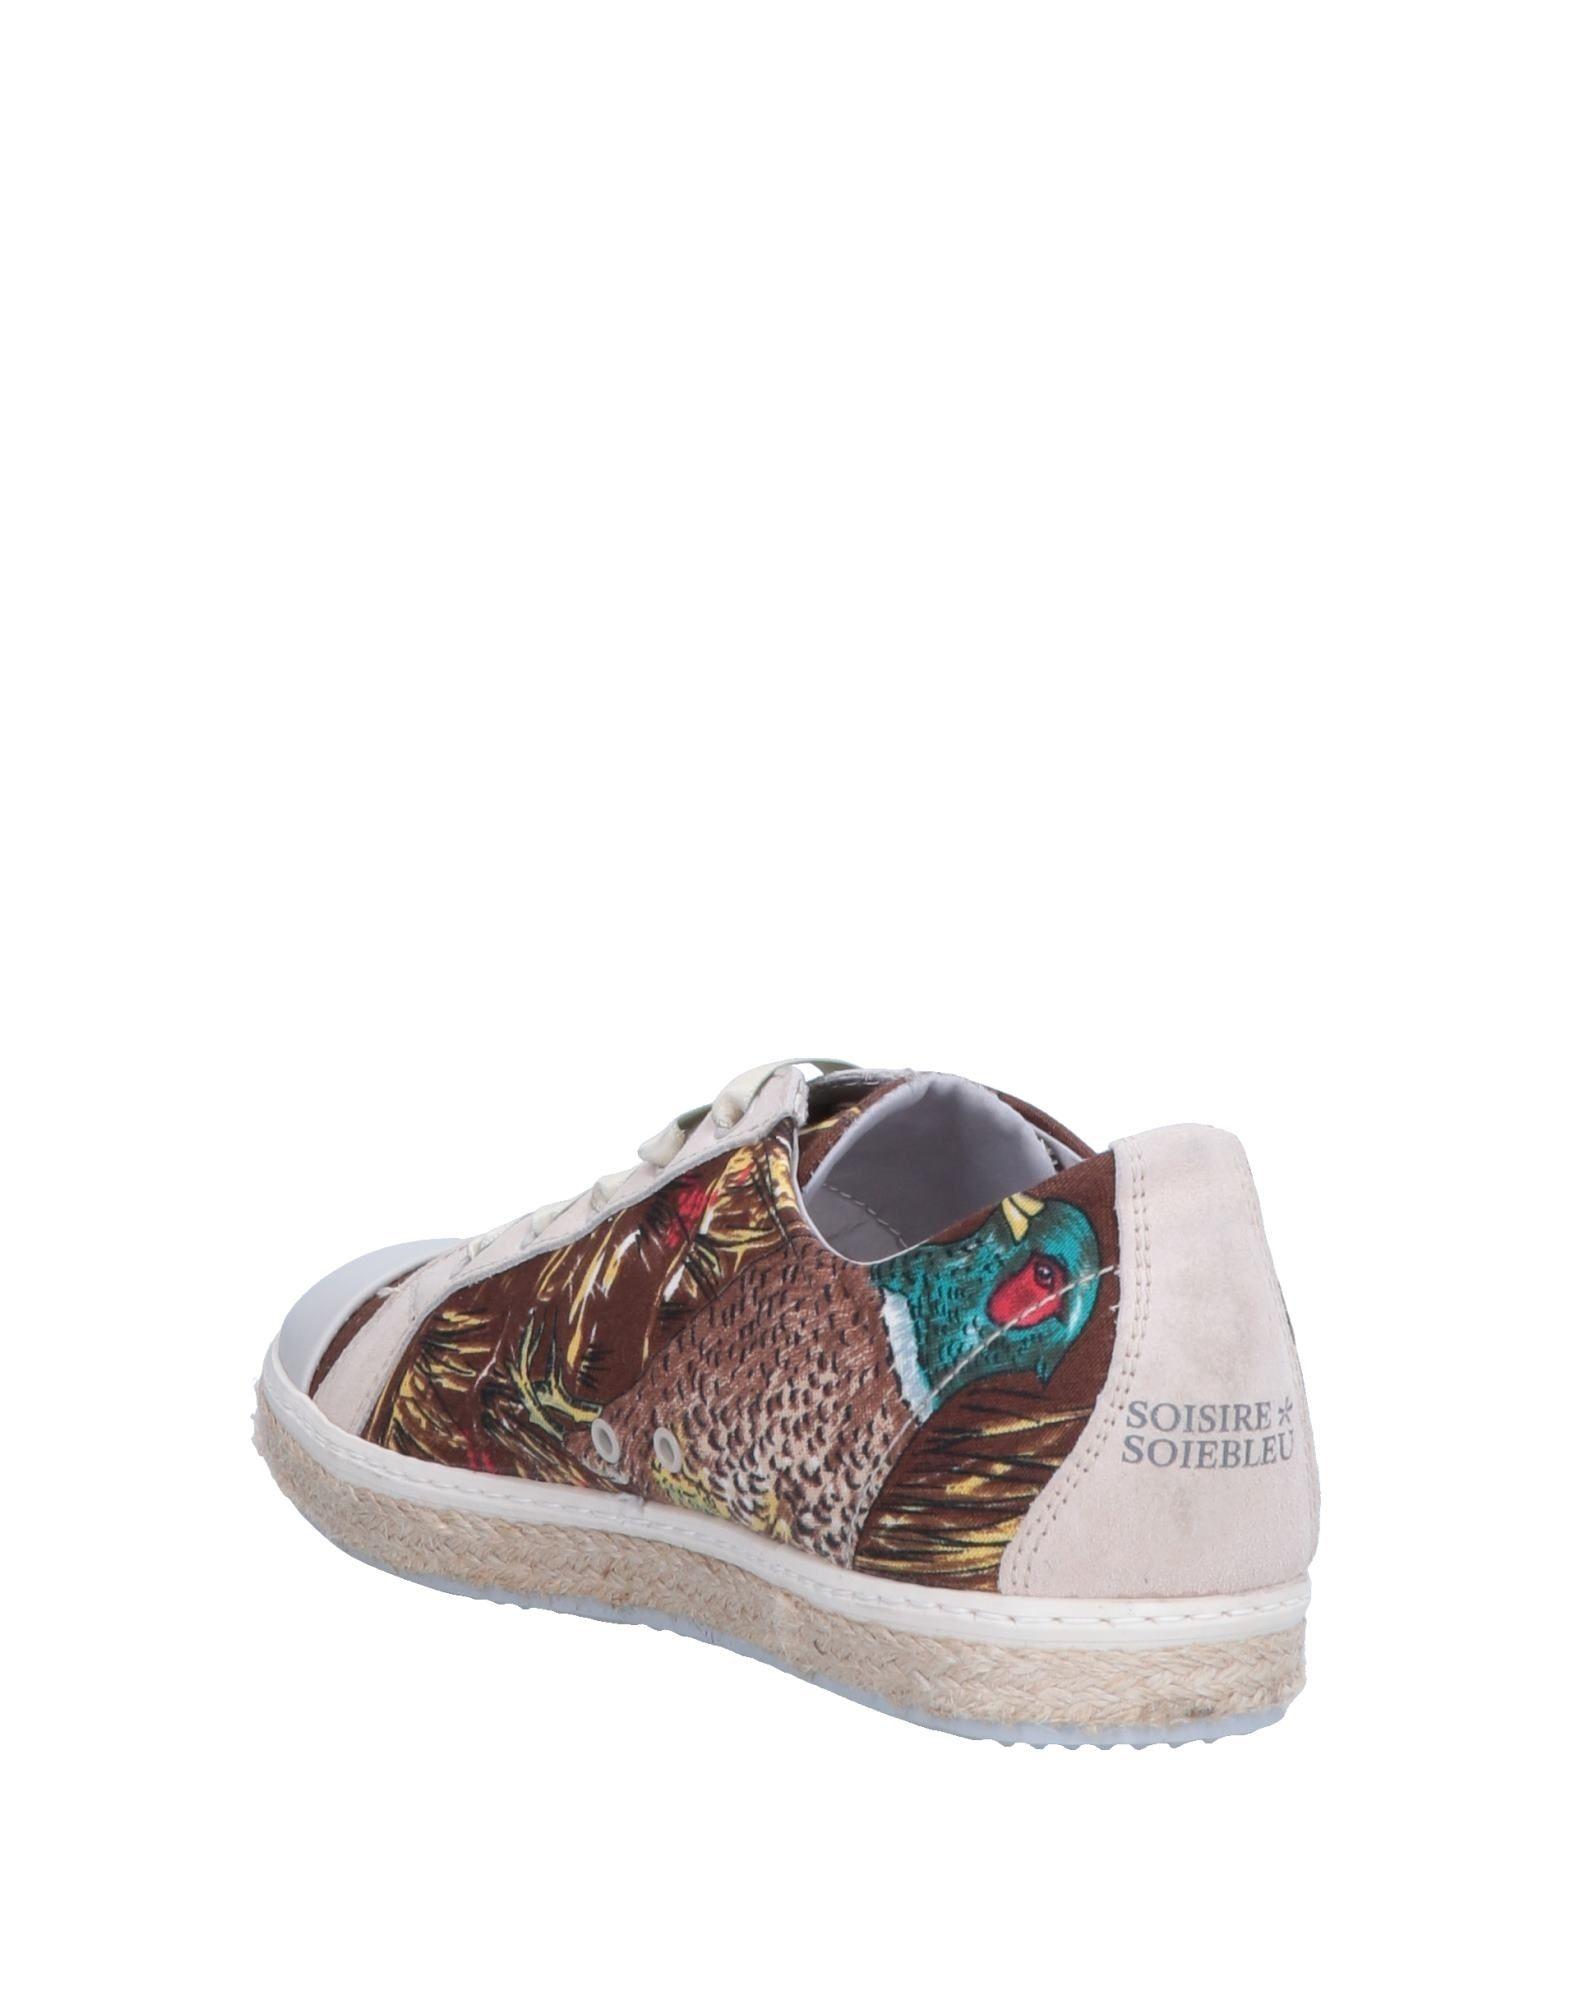 Stilvolle billige Schuhe  Soisire Soiebleu Sneakers Damen  Schuhe 11554244NU a40389